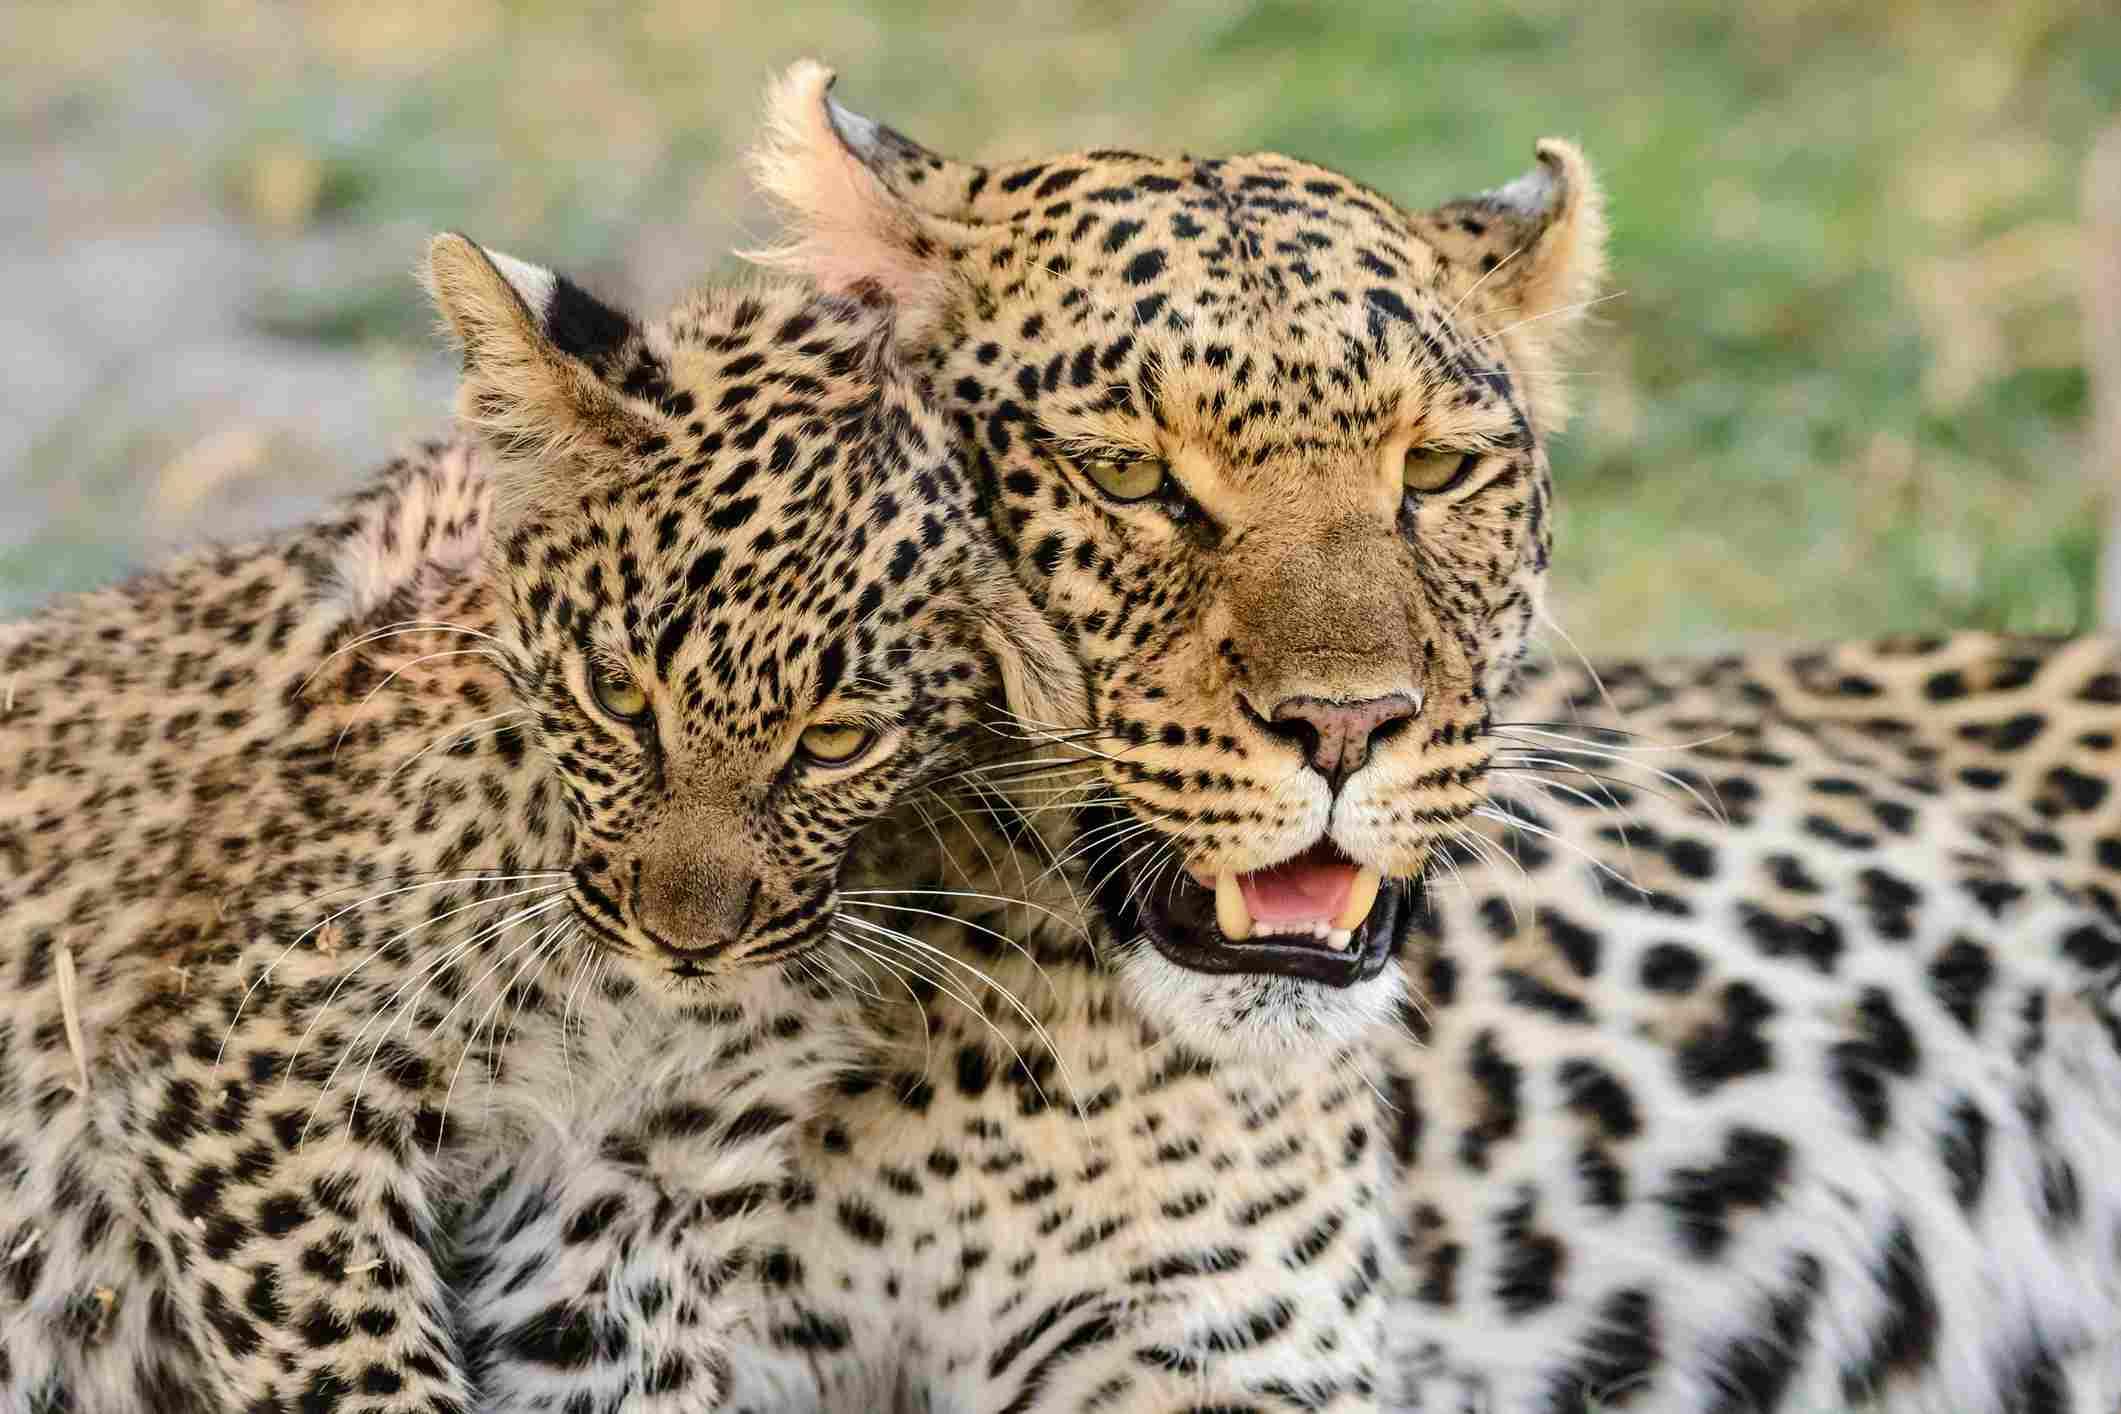 Portrait of leopard with leopard cub, Botswana